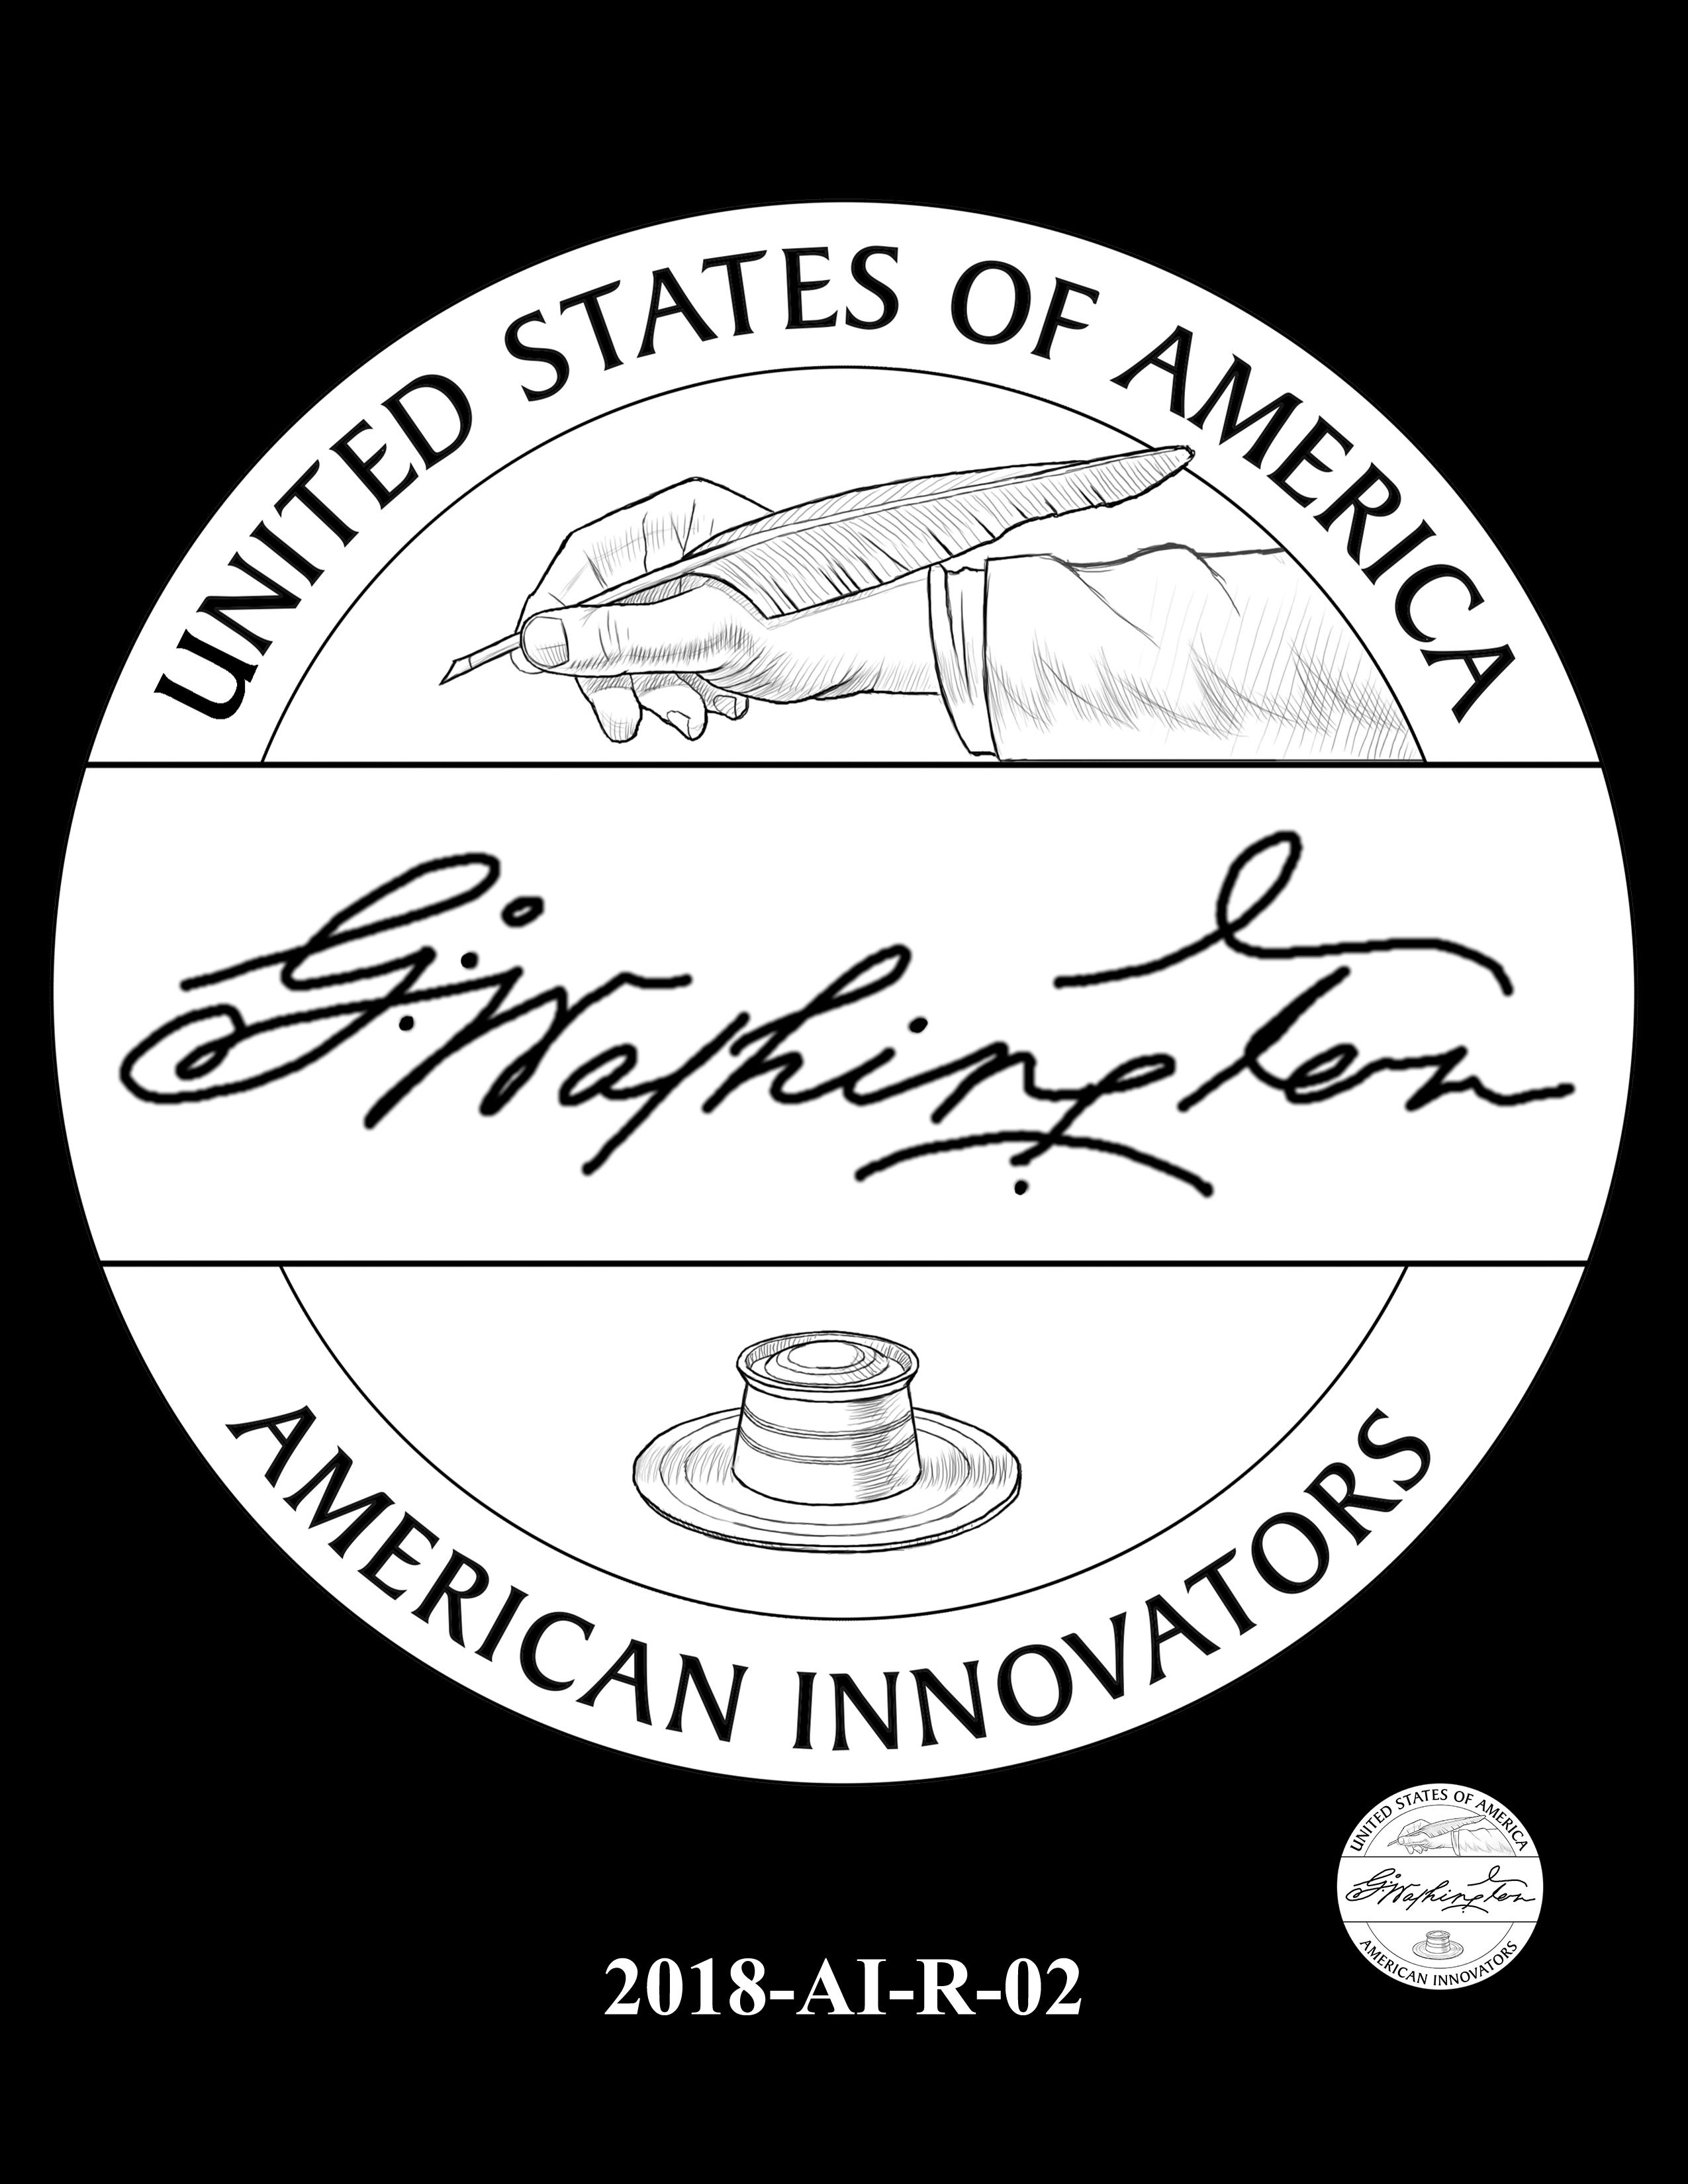 2018-AI-R-02 -- 2018 American Innovation $1 Coin